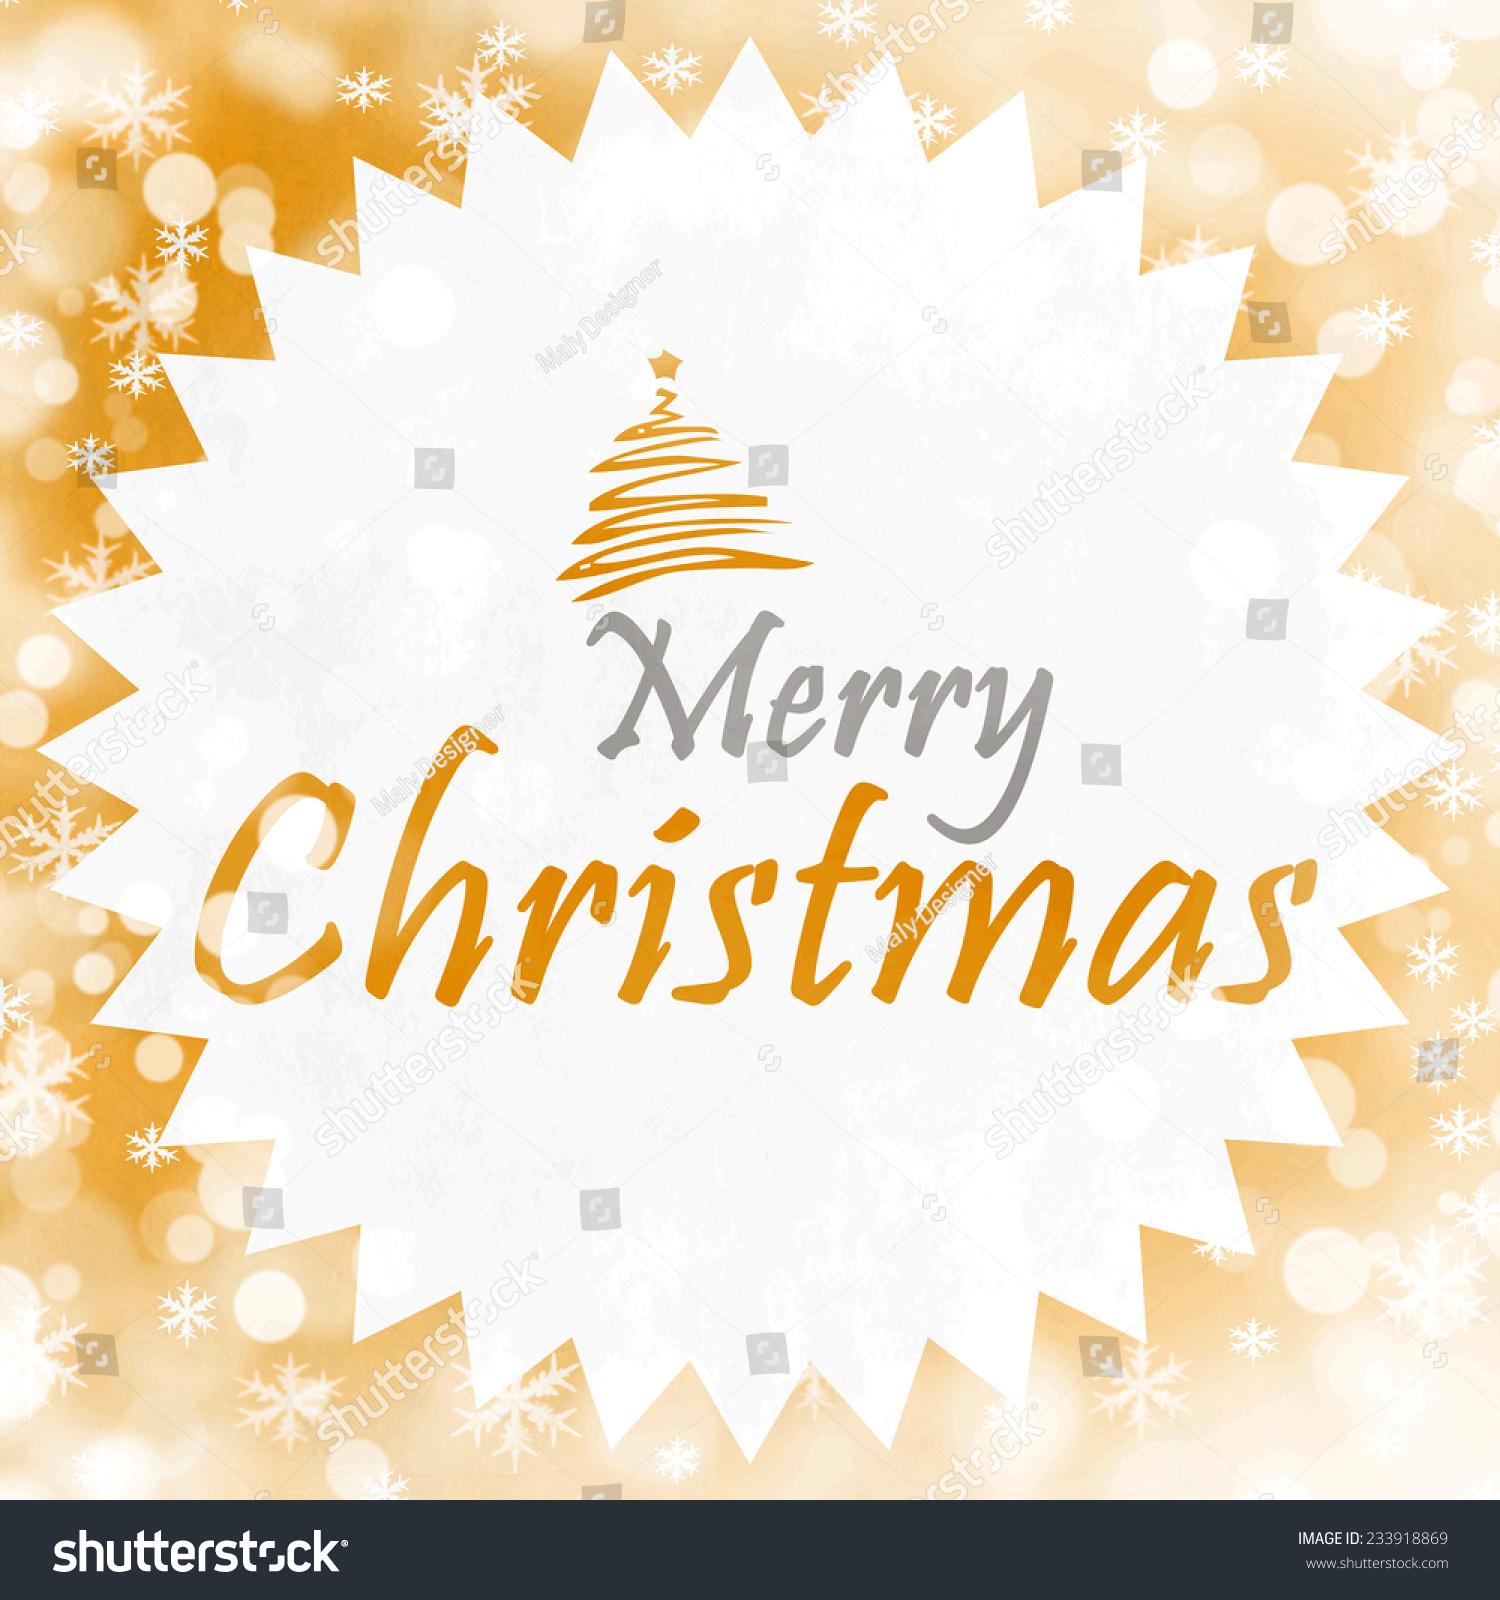 Merry christmas season greetings quote stock illustration 233918869 merry christmas season greetings quote m4hsunfo